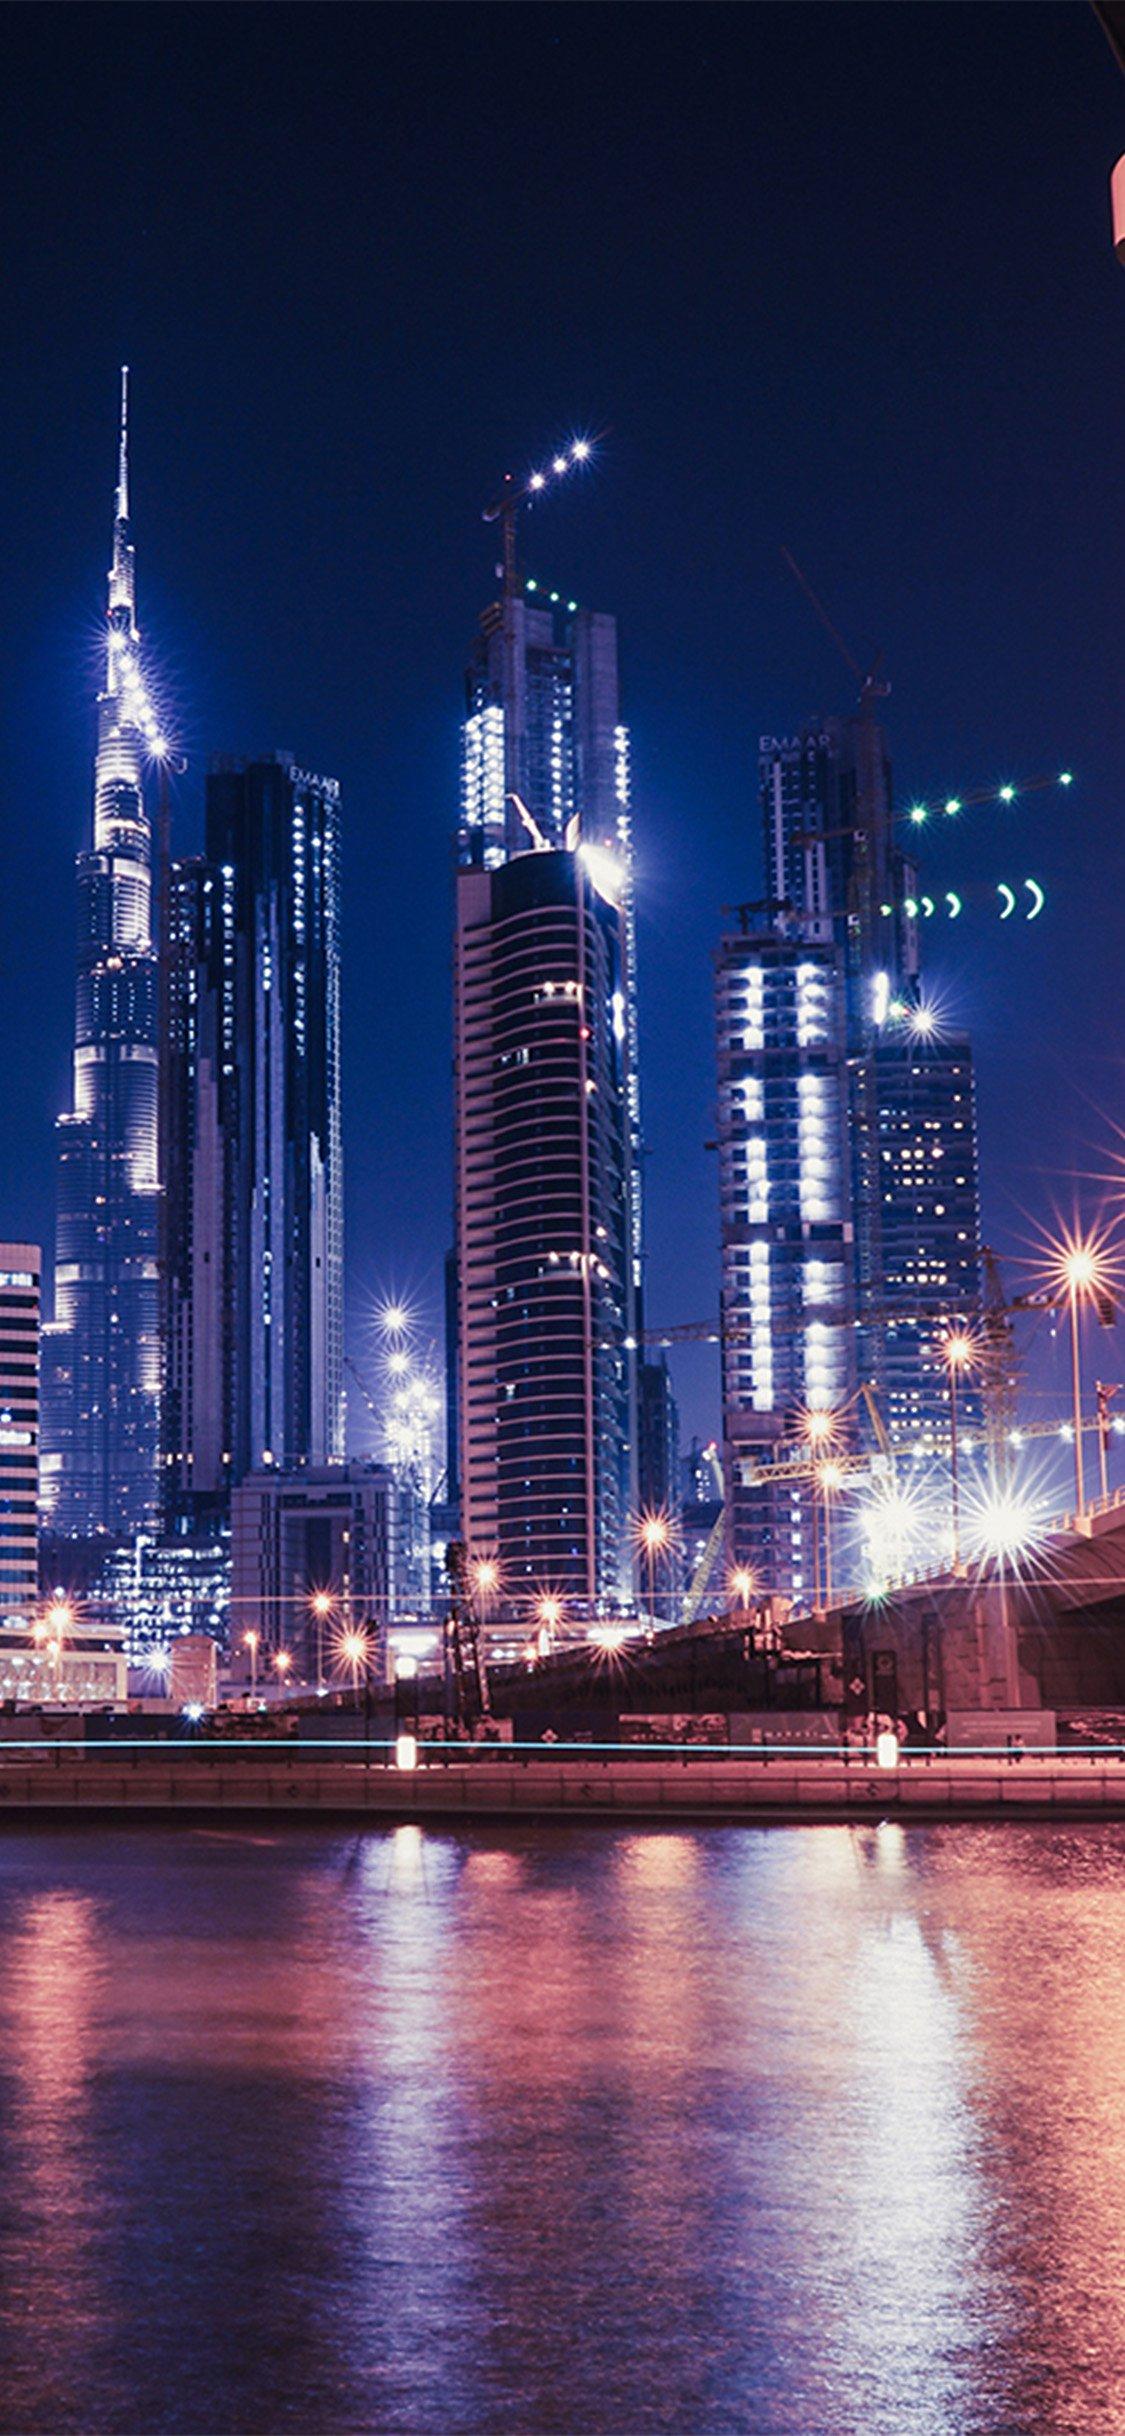 City Night View Hongkong Iphone X Wallpapers Free Download